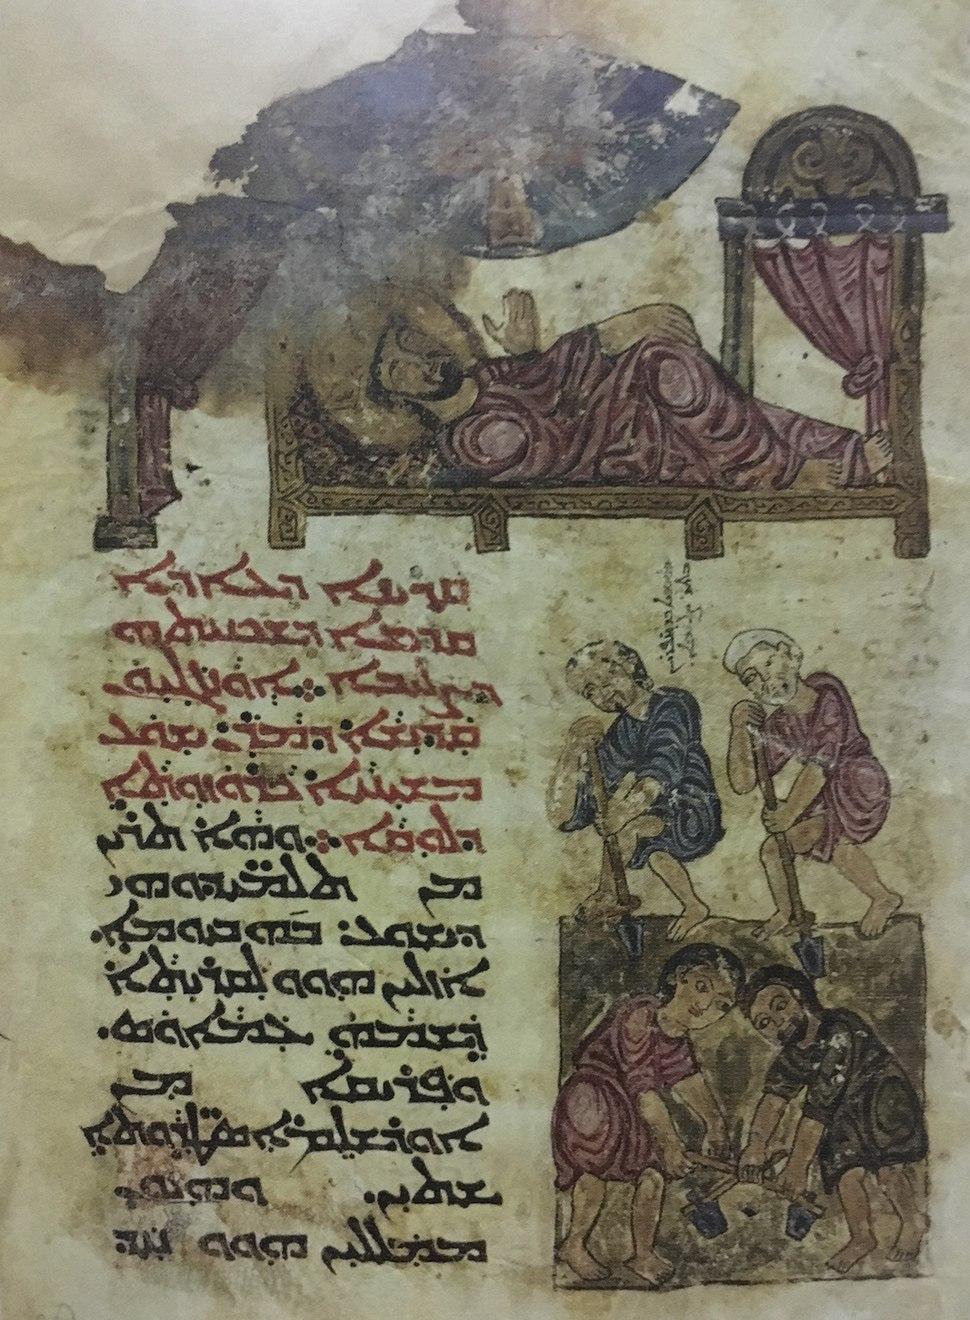 Nestorian Peshitta Gospel – Feast of the Discovery of the Cross